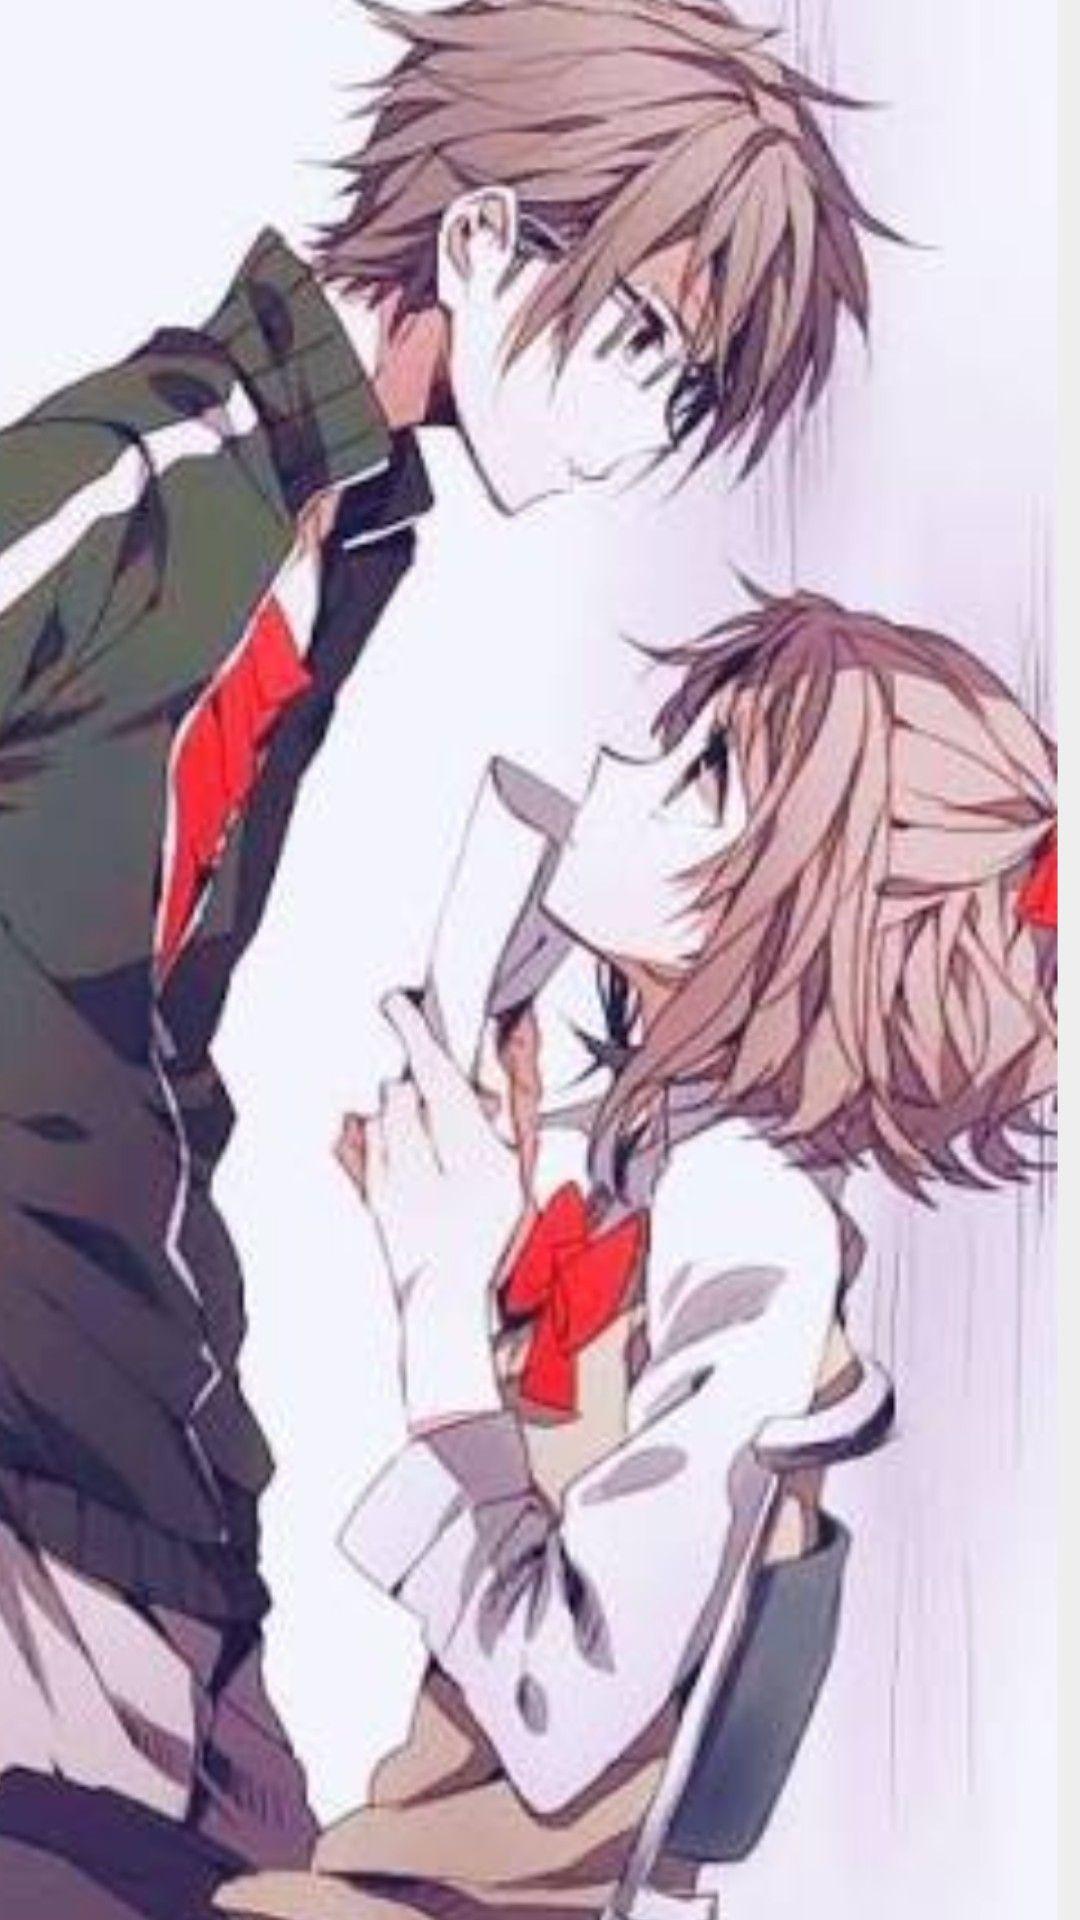 Cute anime girl And boy! Anatomia 14 | anatomia (anime) | Pinterest